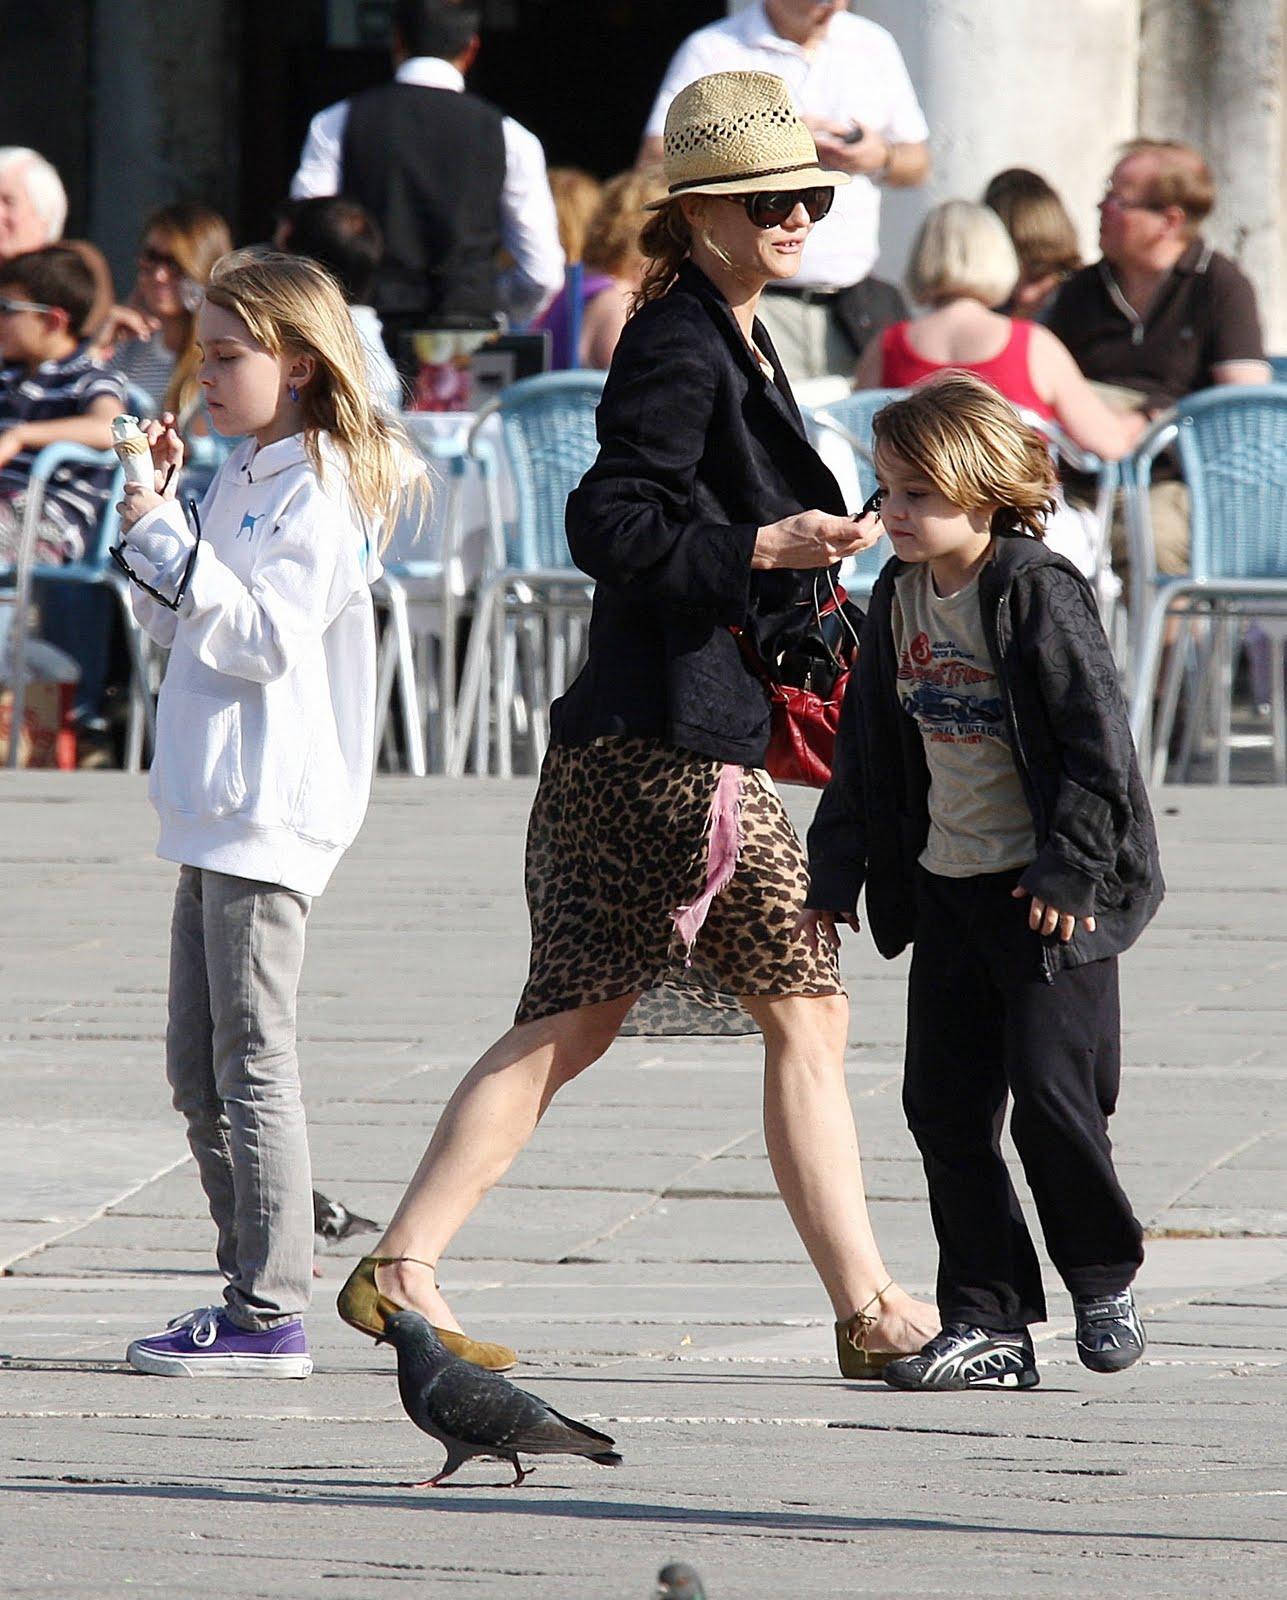 Депп и паради дети фото